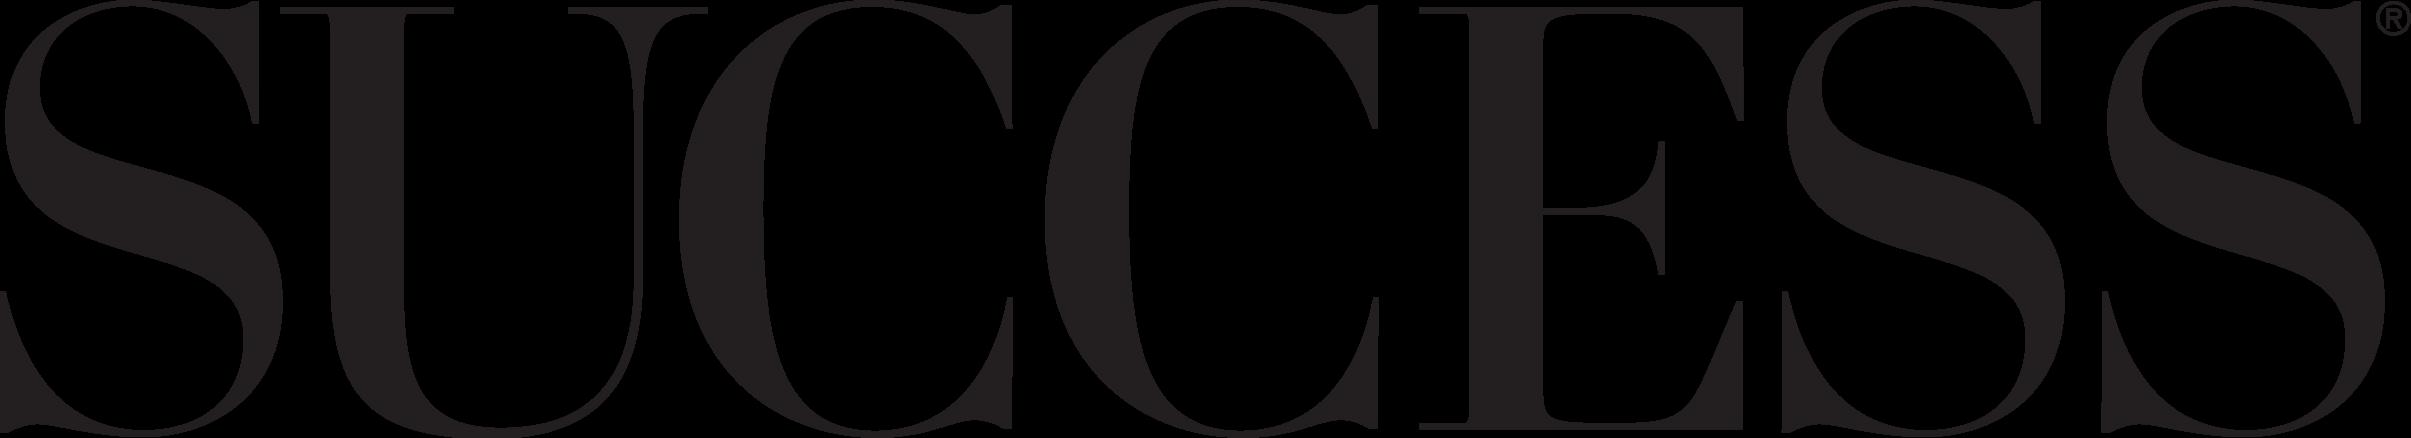 Success Magazine - personal branding